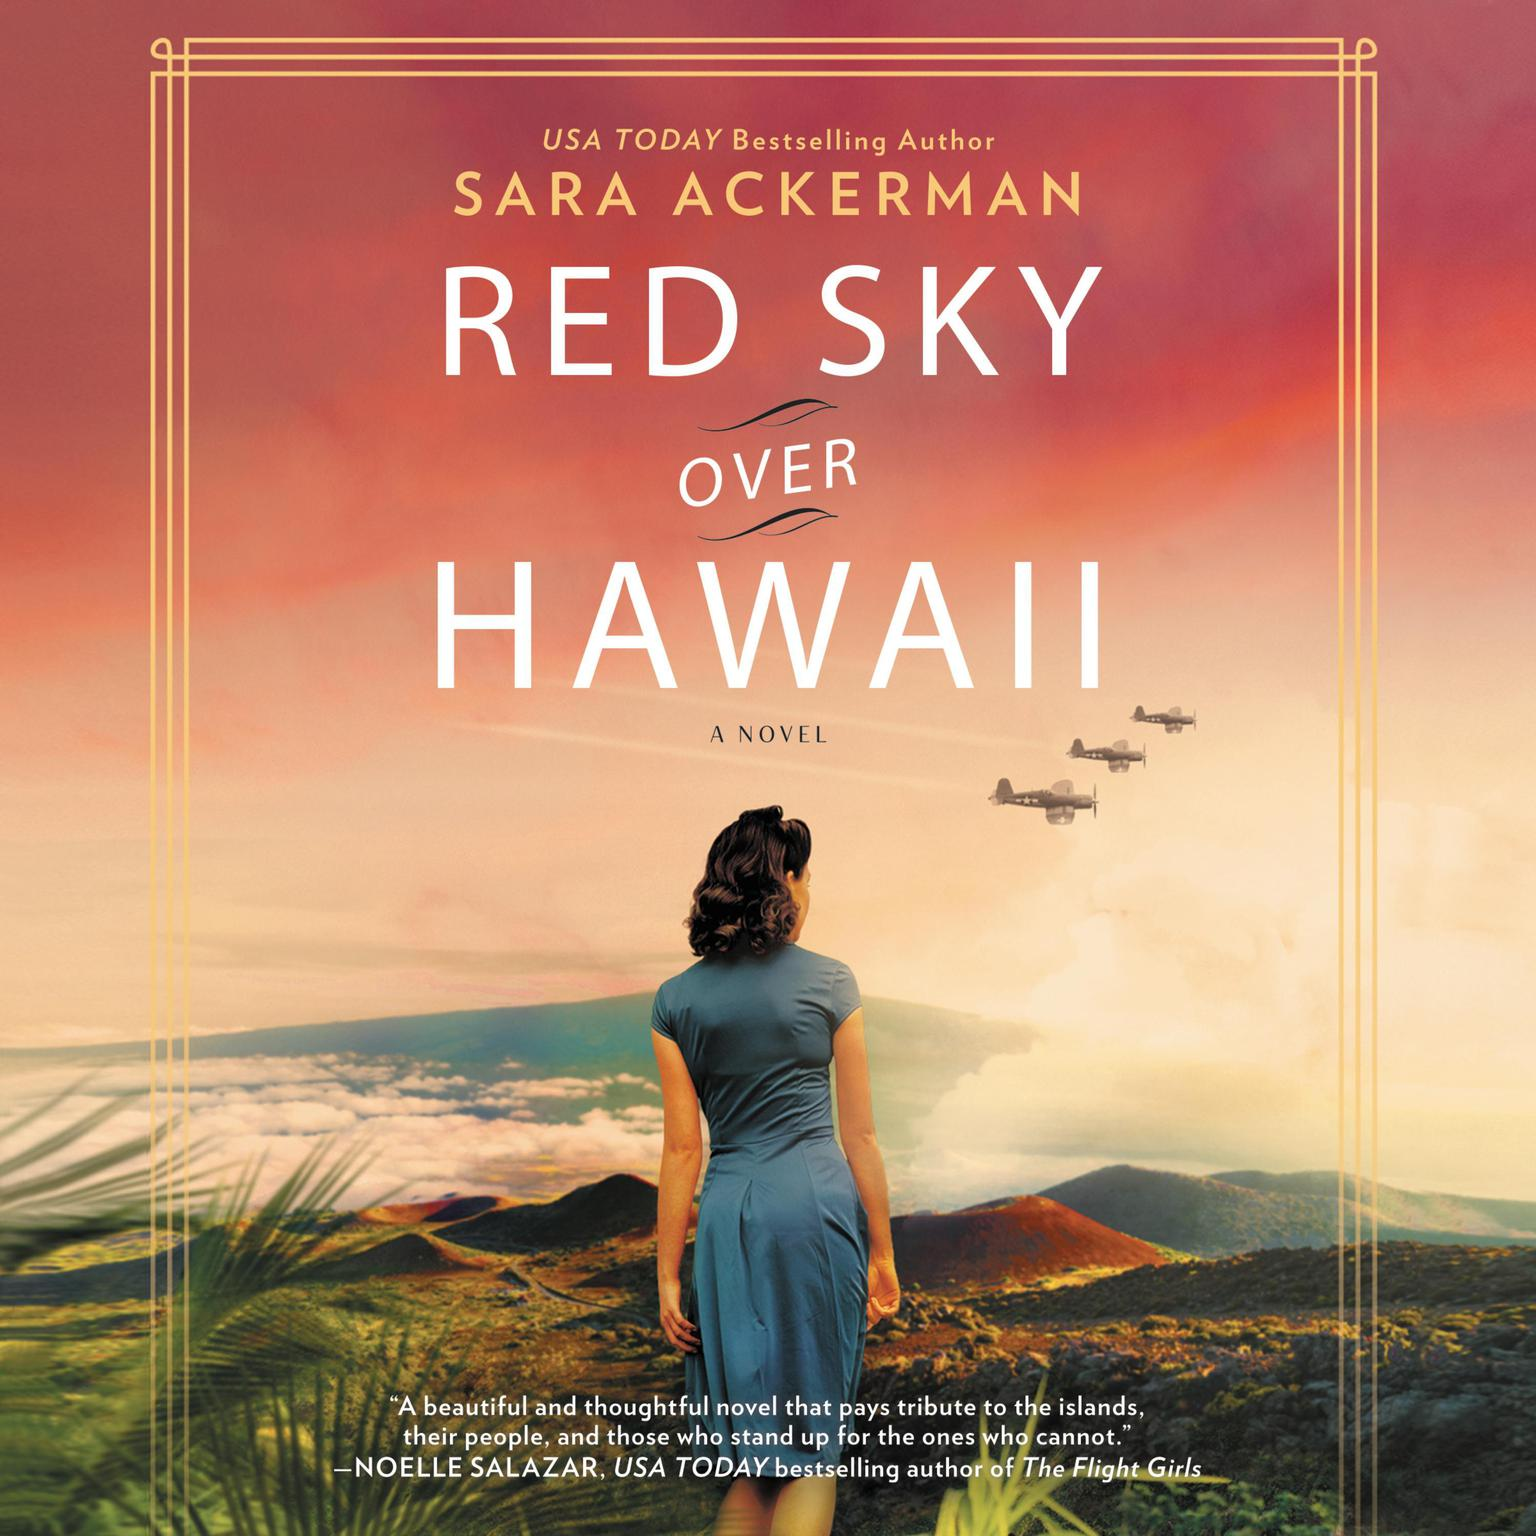 Red Sky Over Hawaii Audiobook, by Sara Ackerman